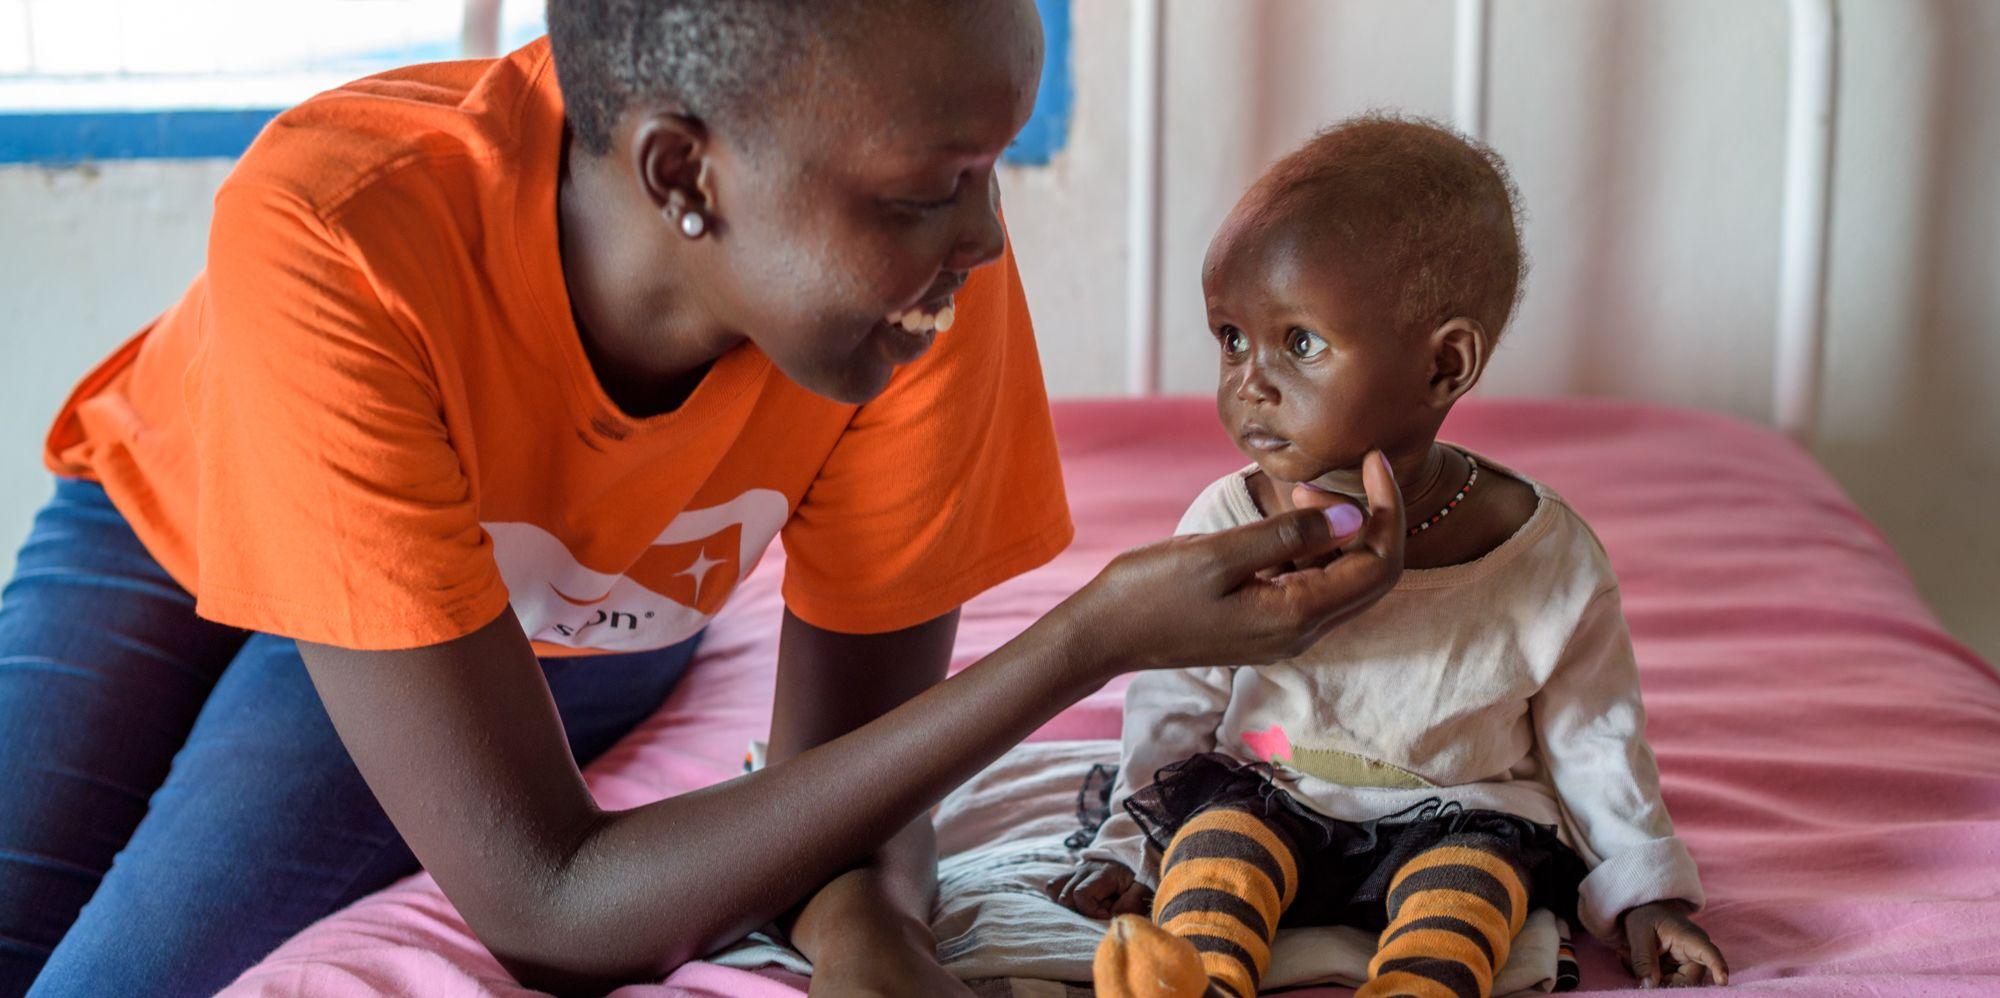 "<alt=""World Vision staff helping malnourished child"">"